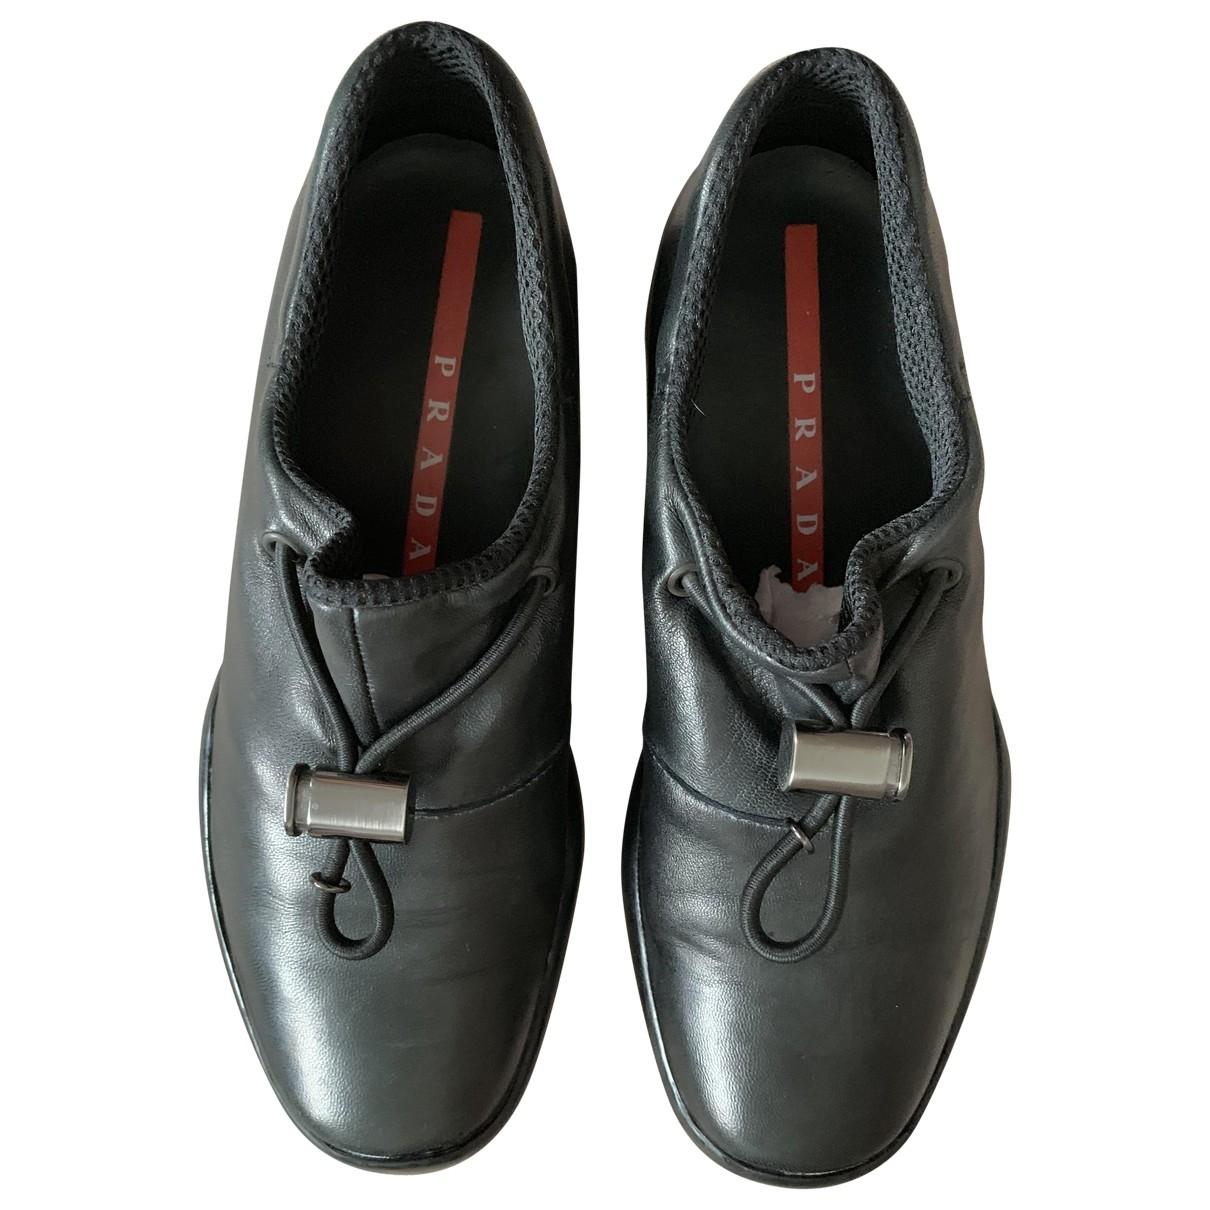 Prada \N Black Leather Trainers for Women 35.5 EU